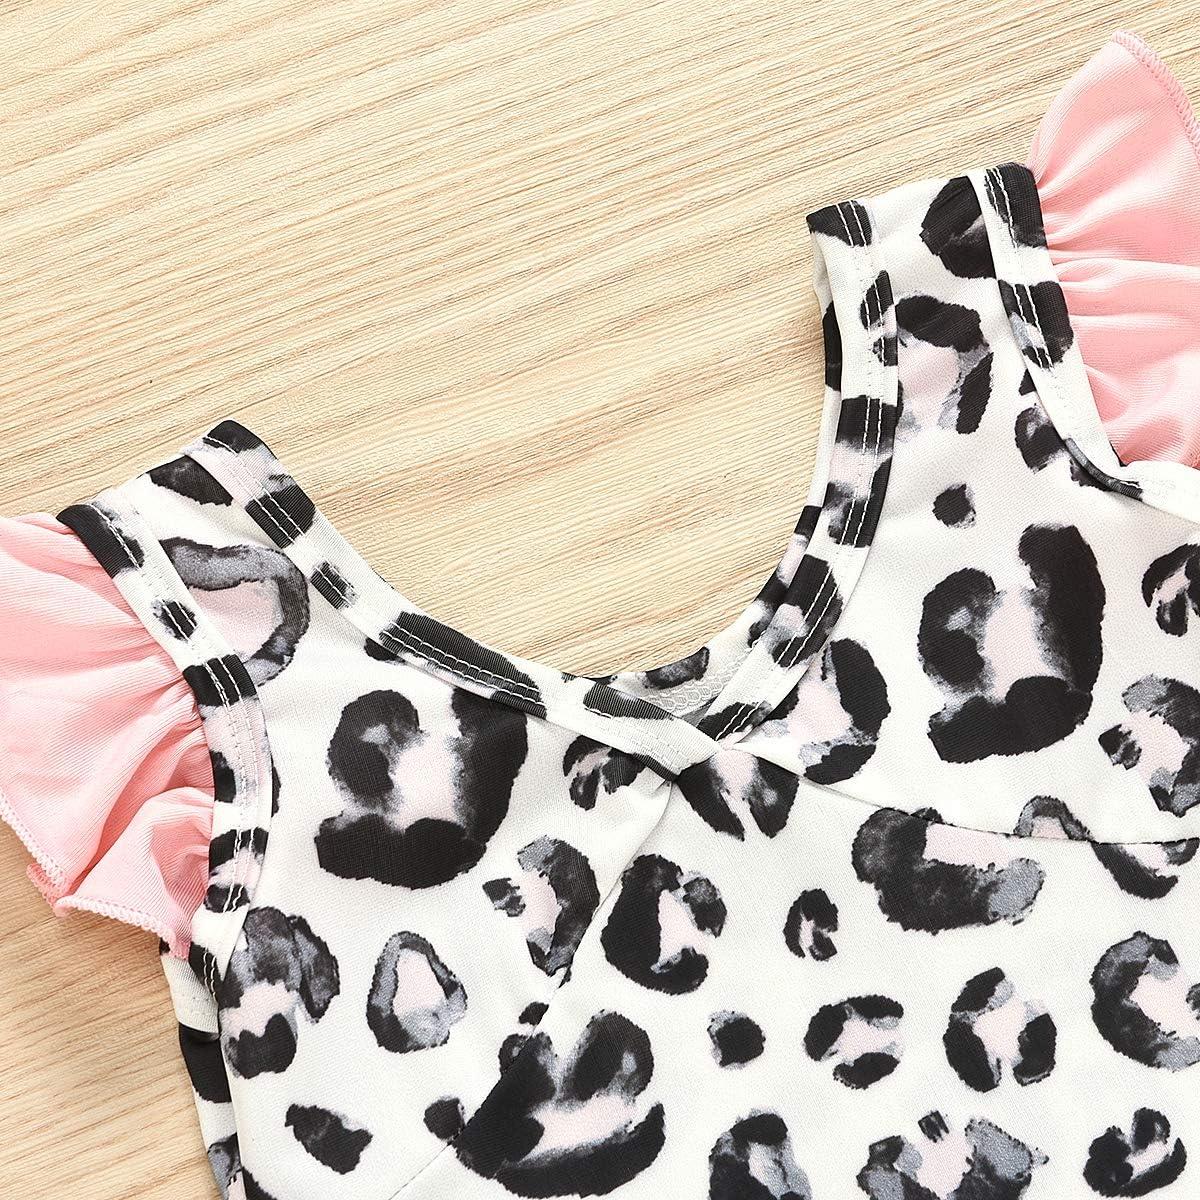 Kosusanill Newborn Toddler Baby Girl One Shoulder Swimsuit Infant One Piece Bathing Suit Beach Wear Sunsuit